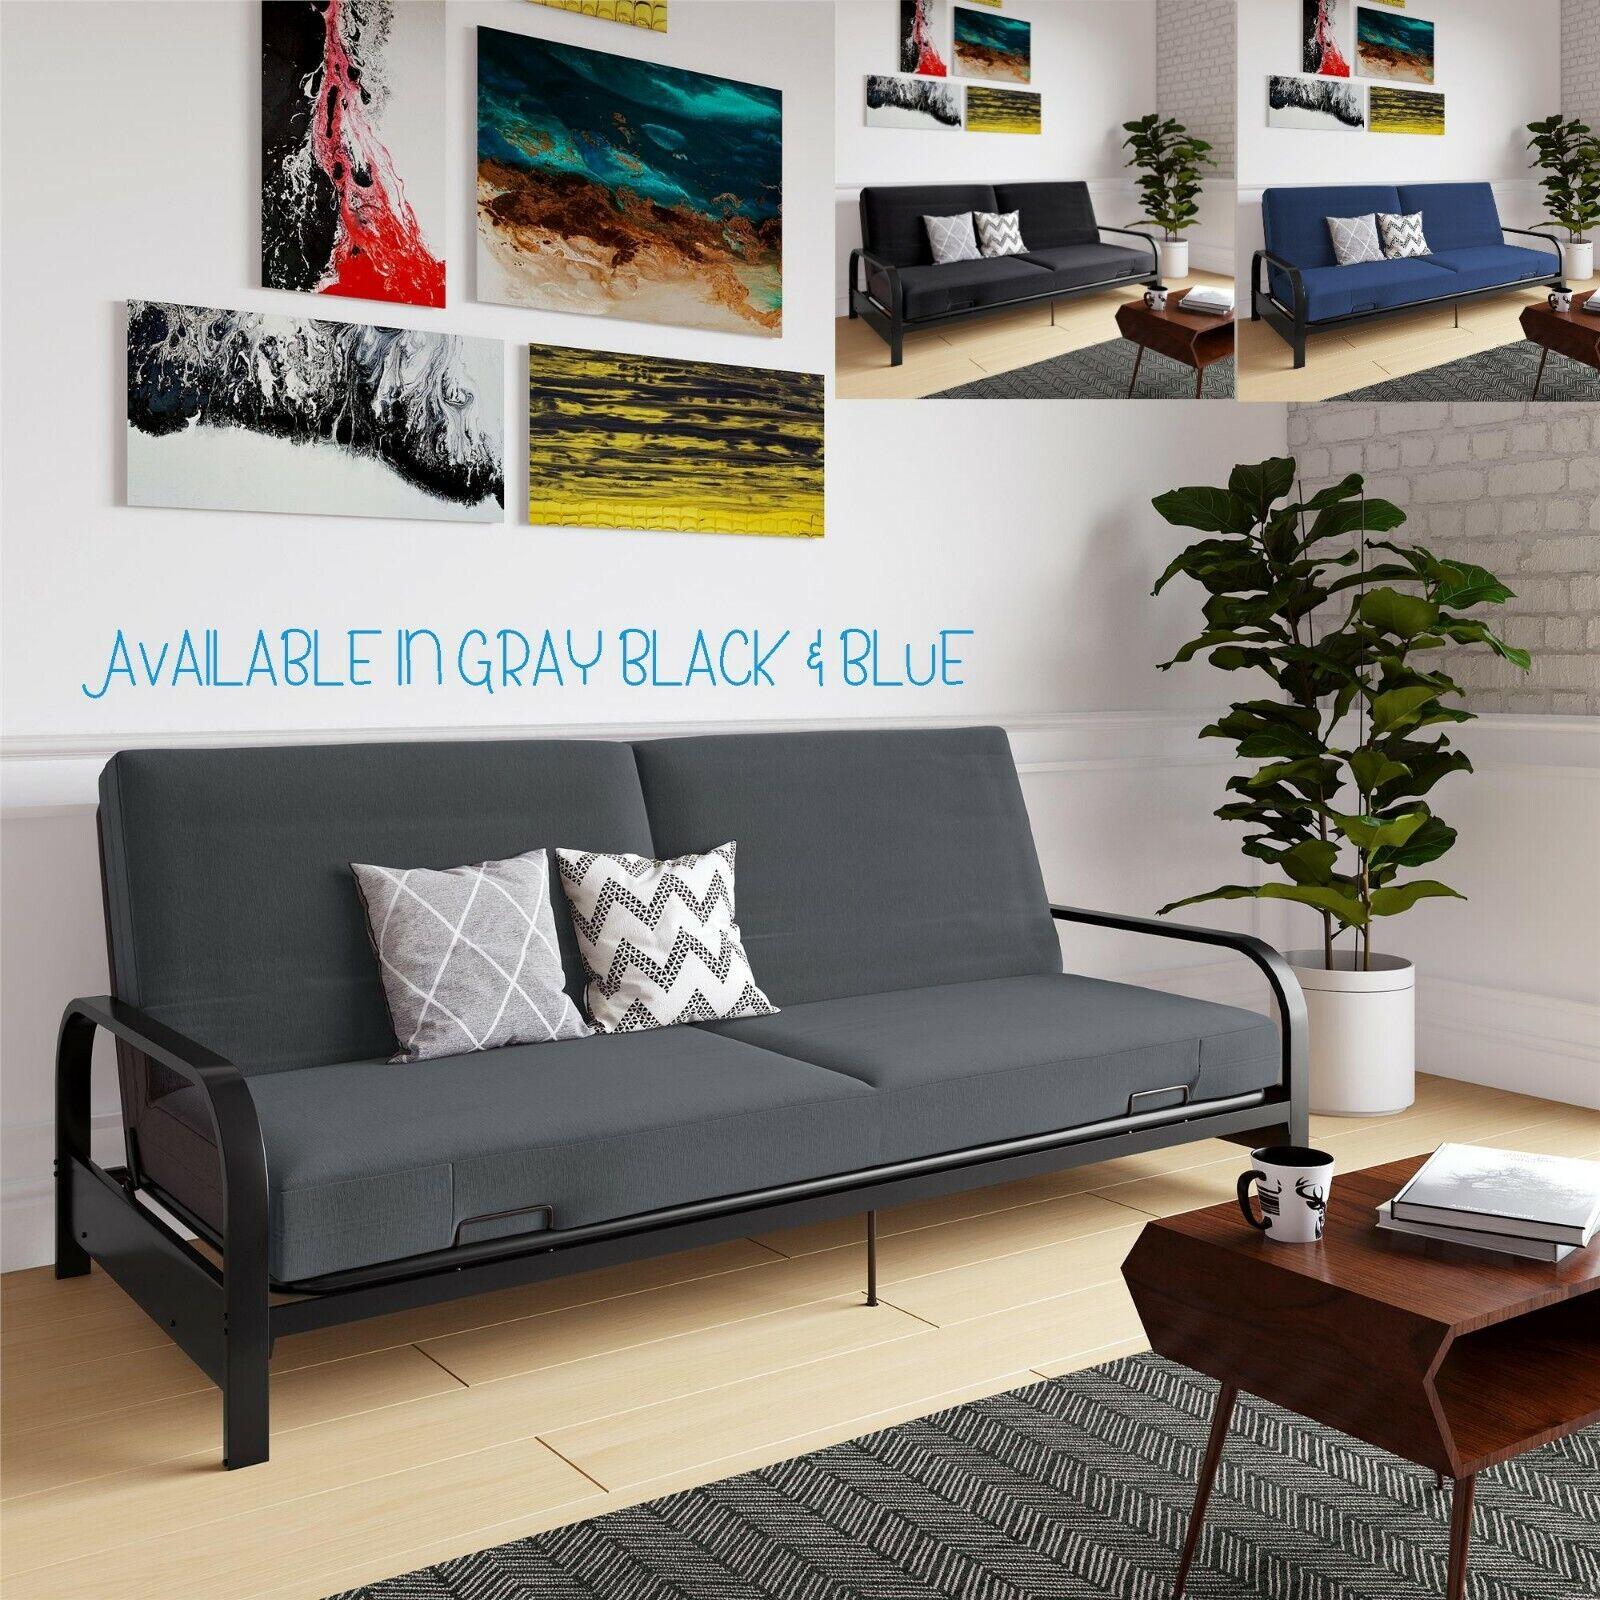 - Full Hospitality Bed 6